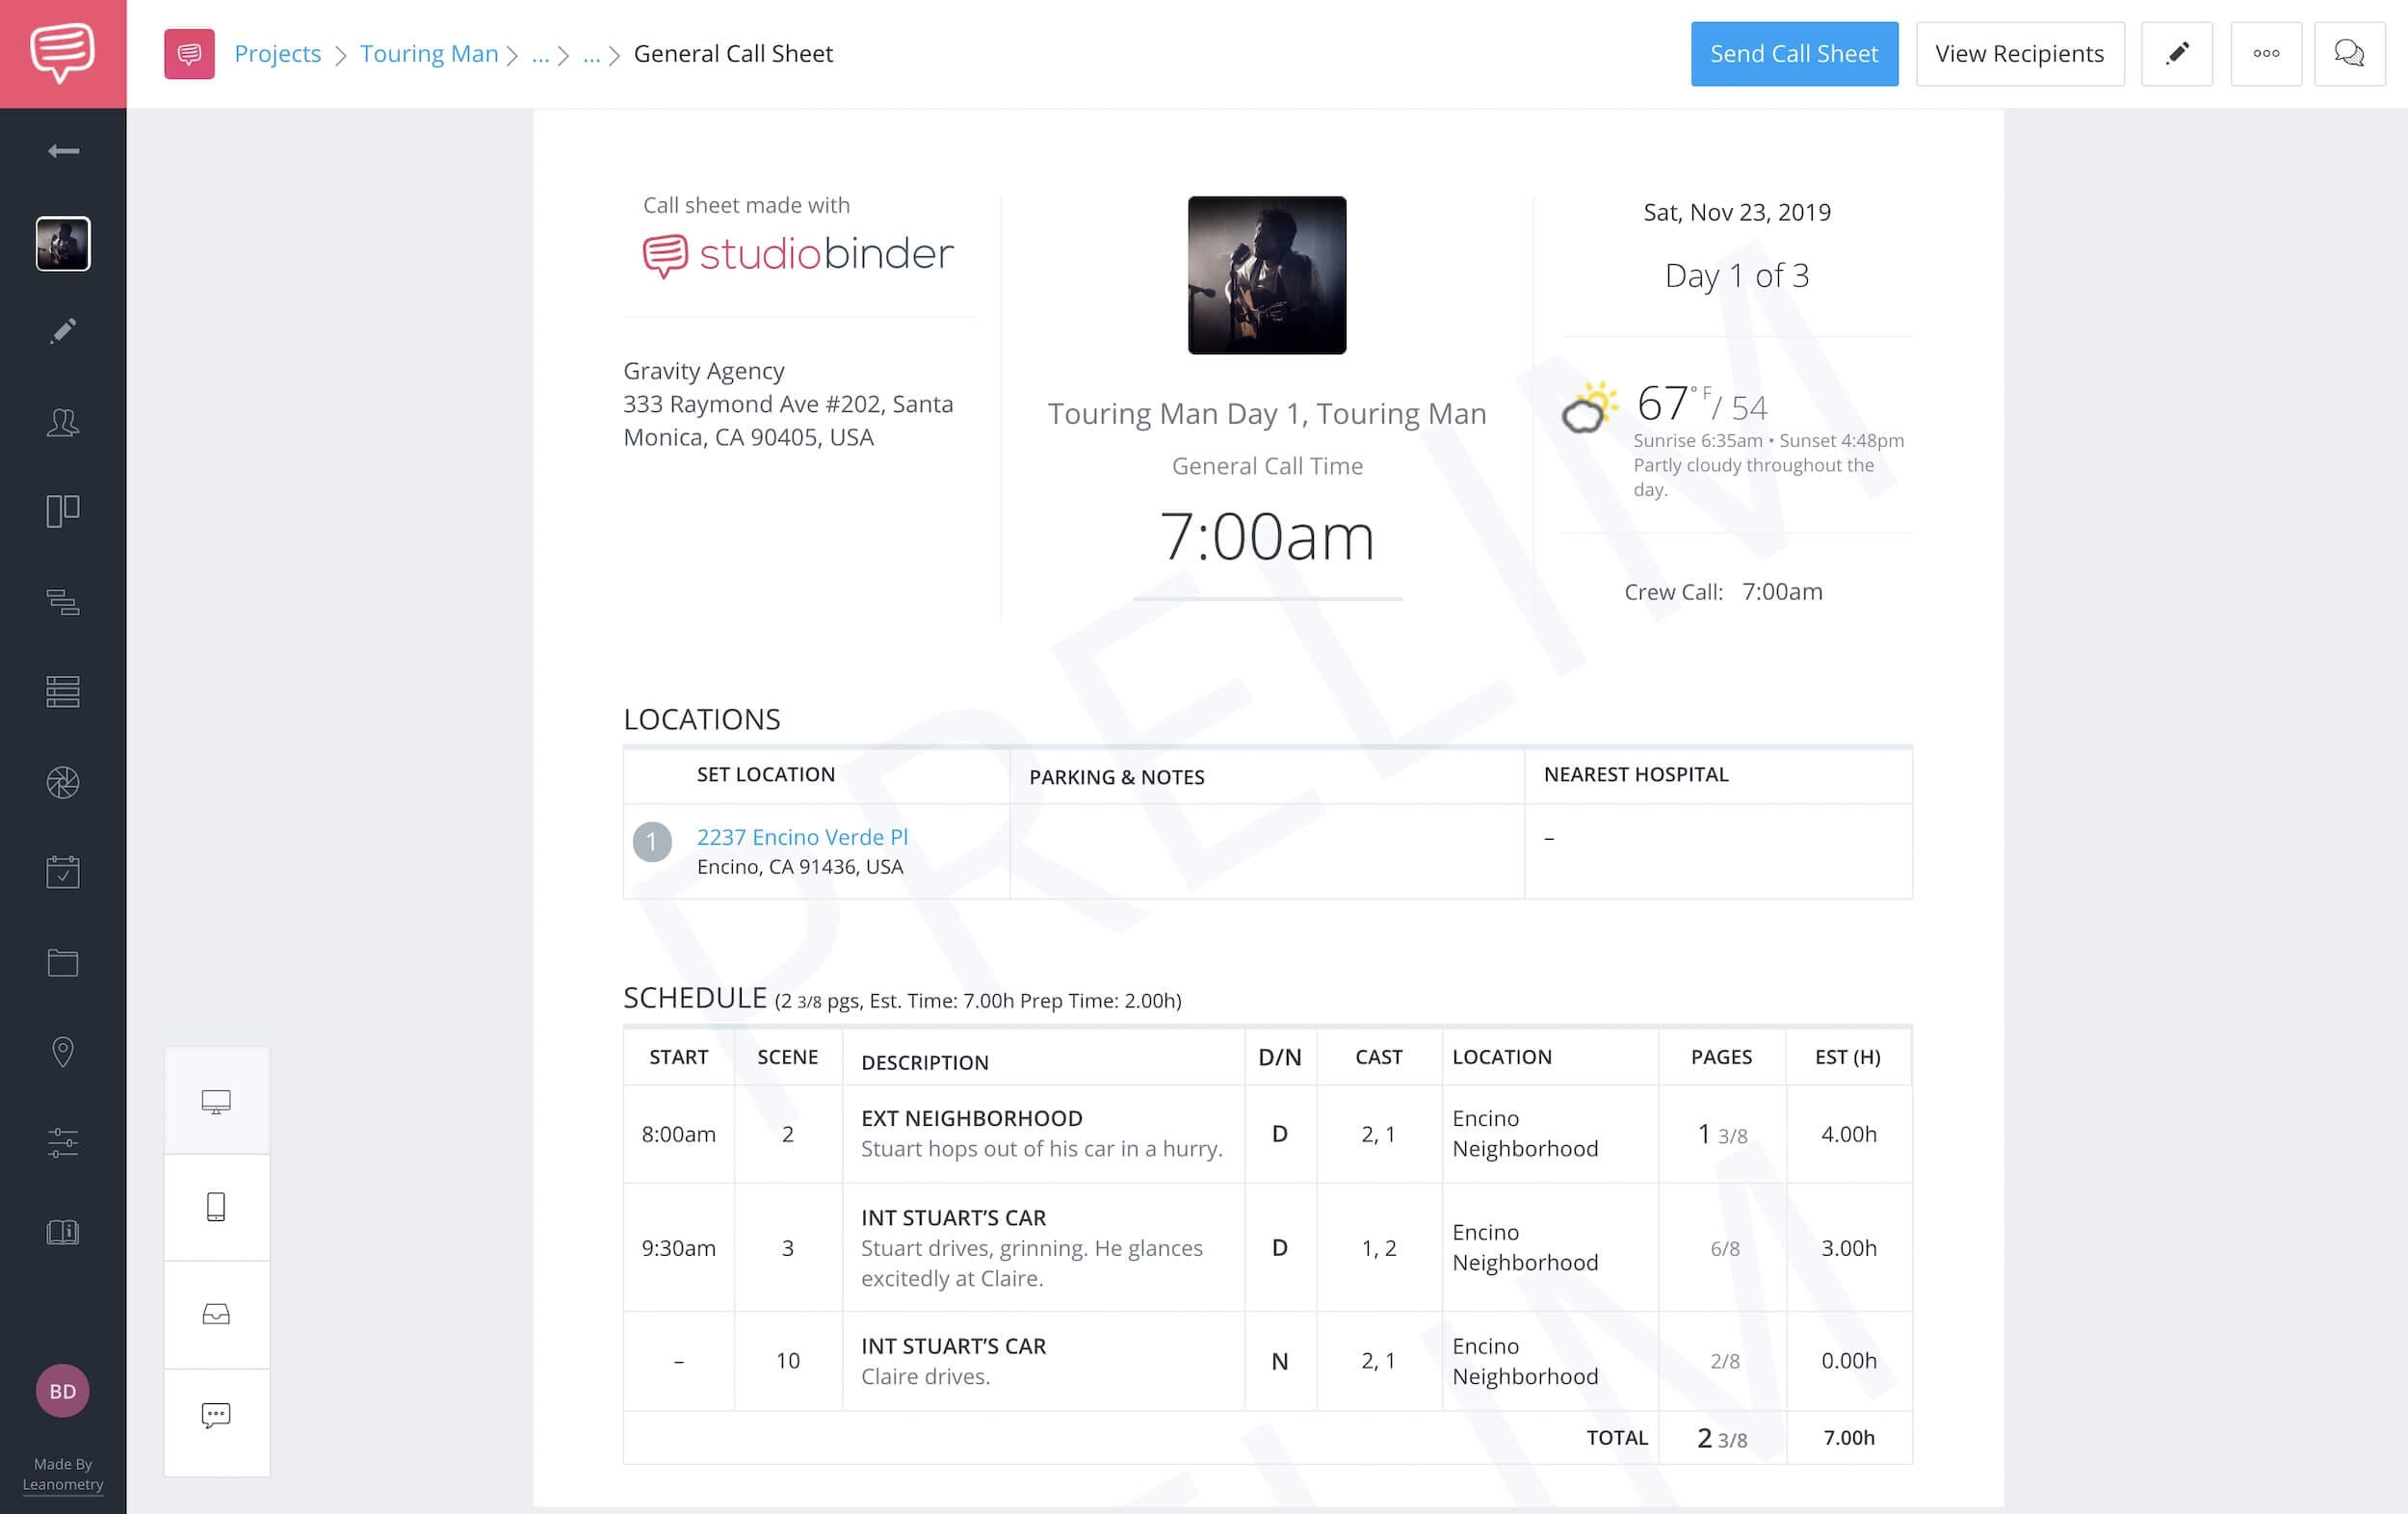 How to Renumber Scenes in StudioBinder - StudioBinder Call Sheet Template and App Software